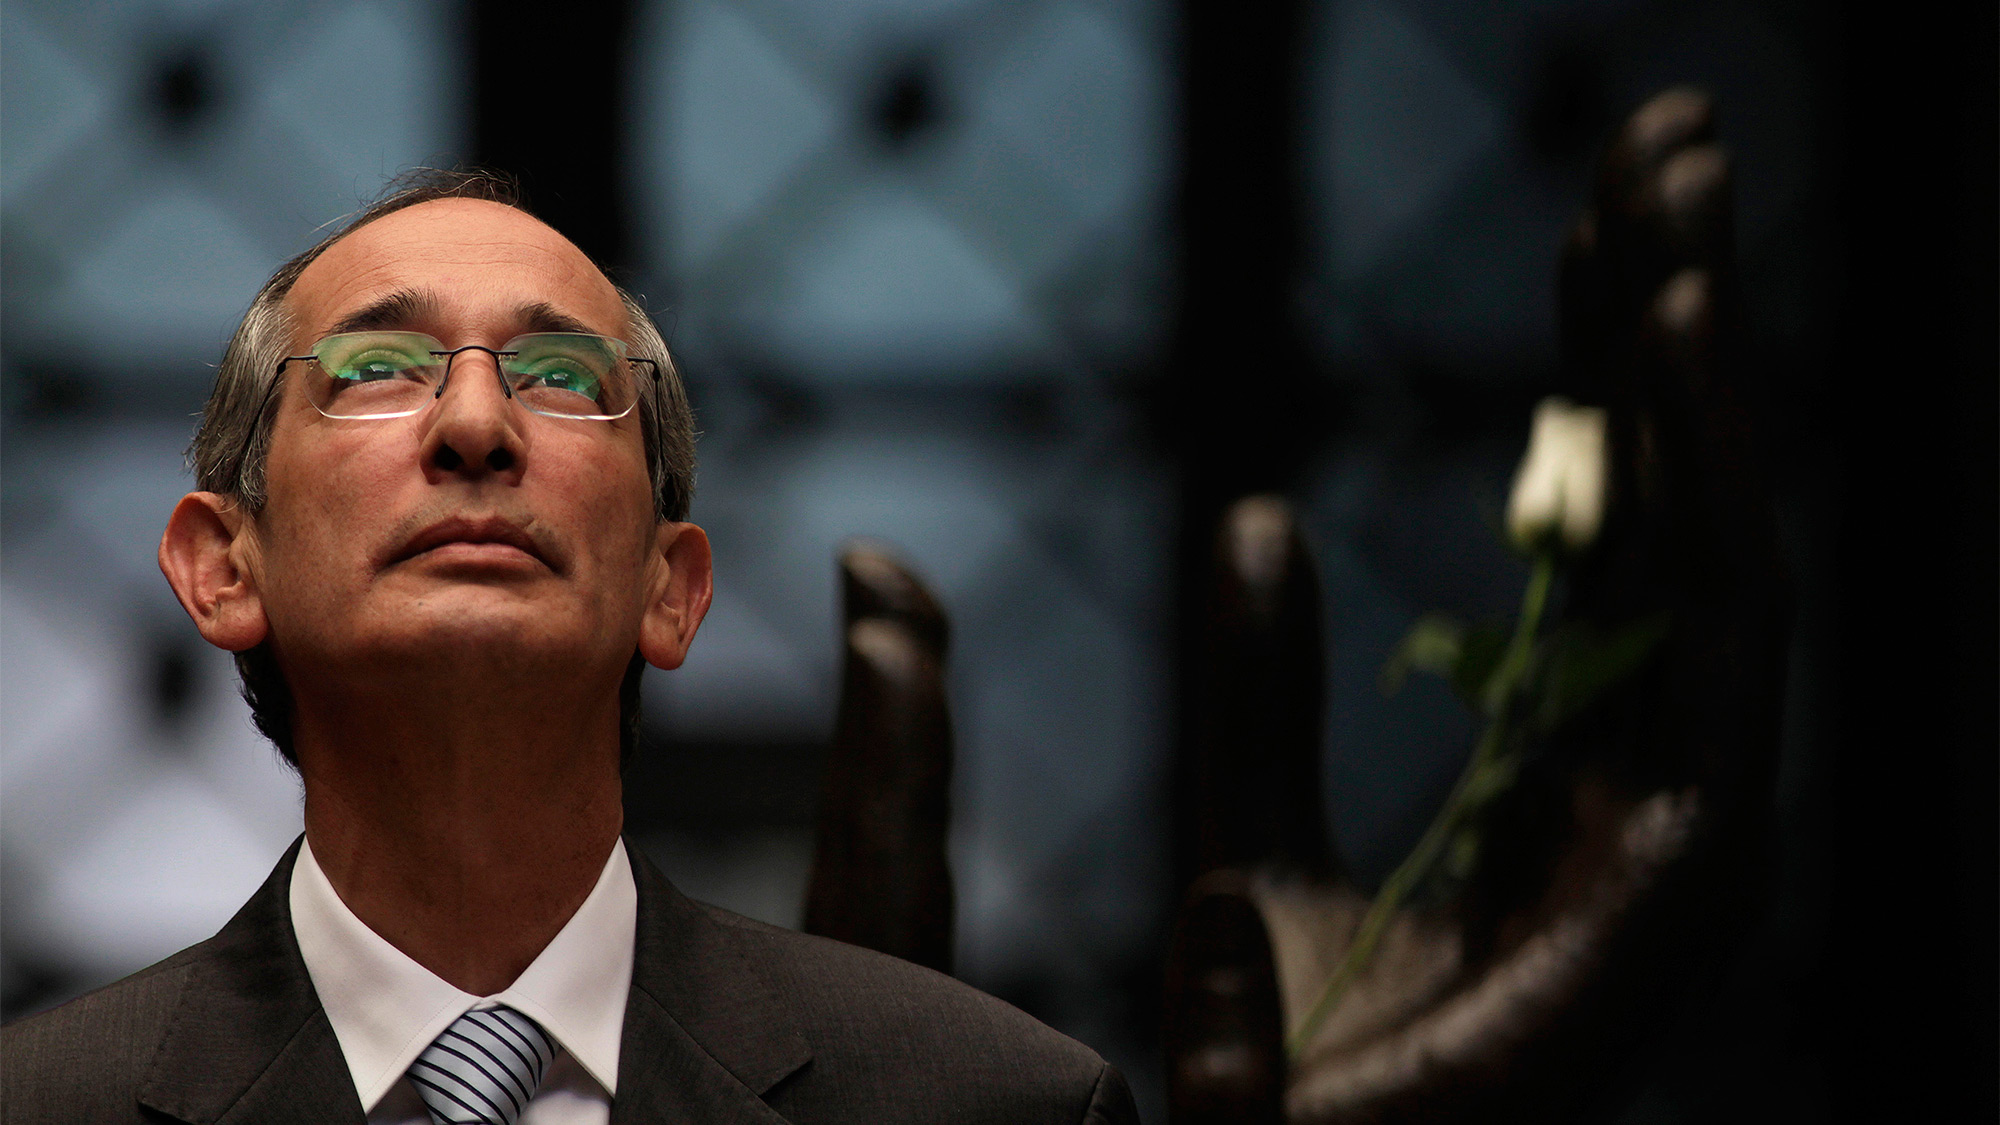 Detienen a expresidente de Guatemala por caso de corrupción